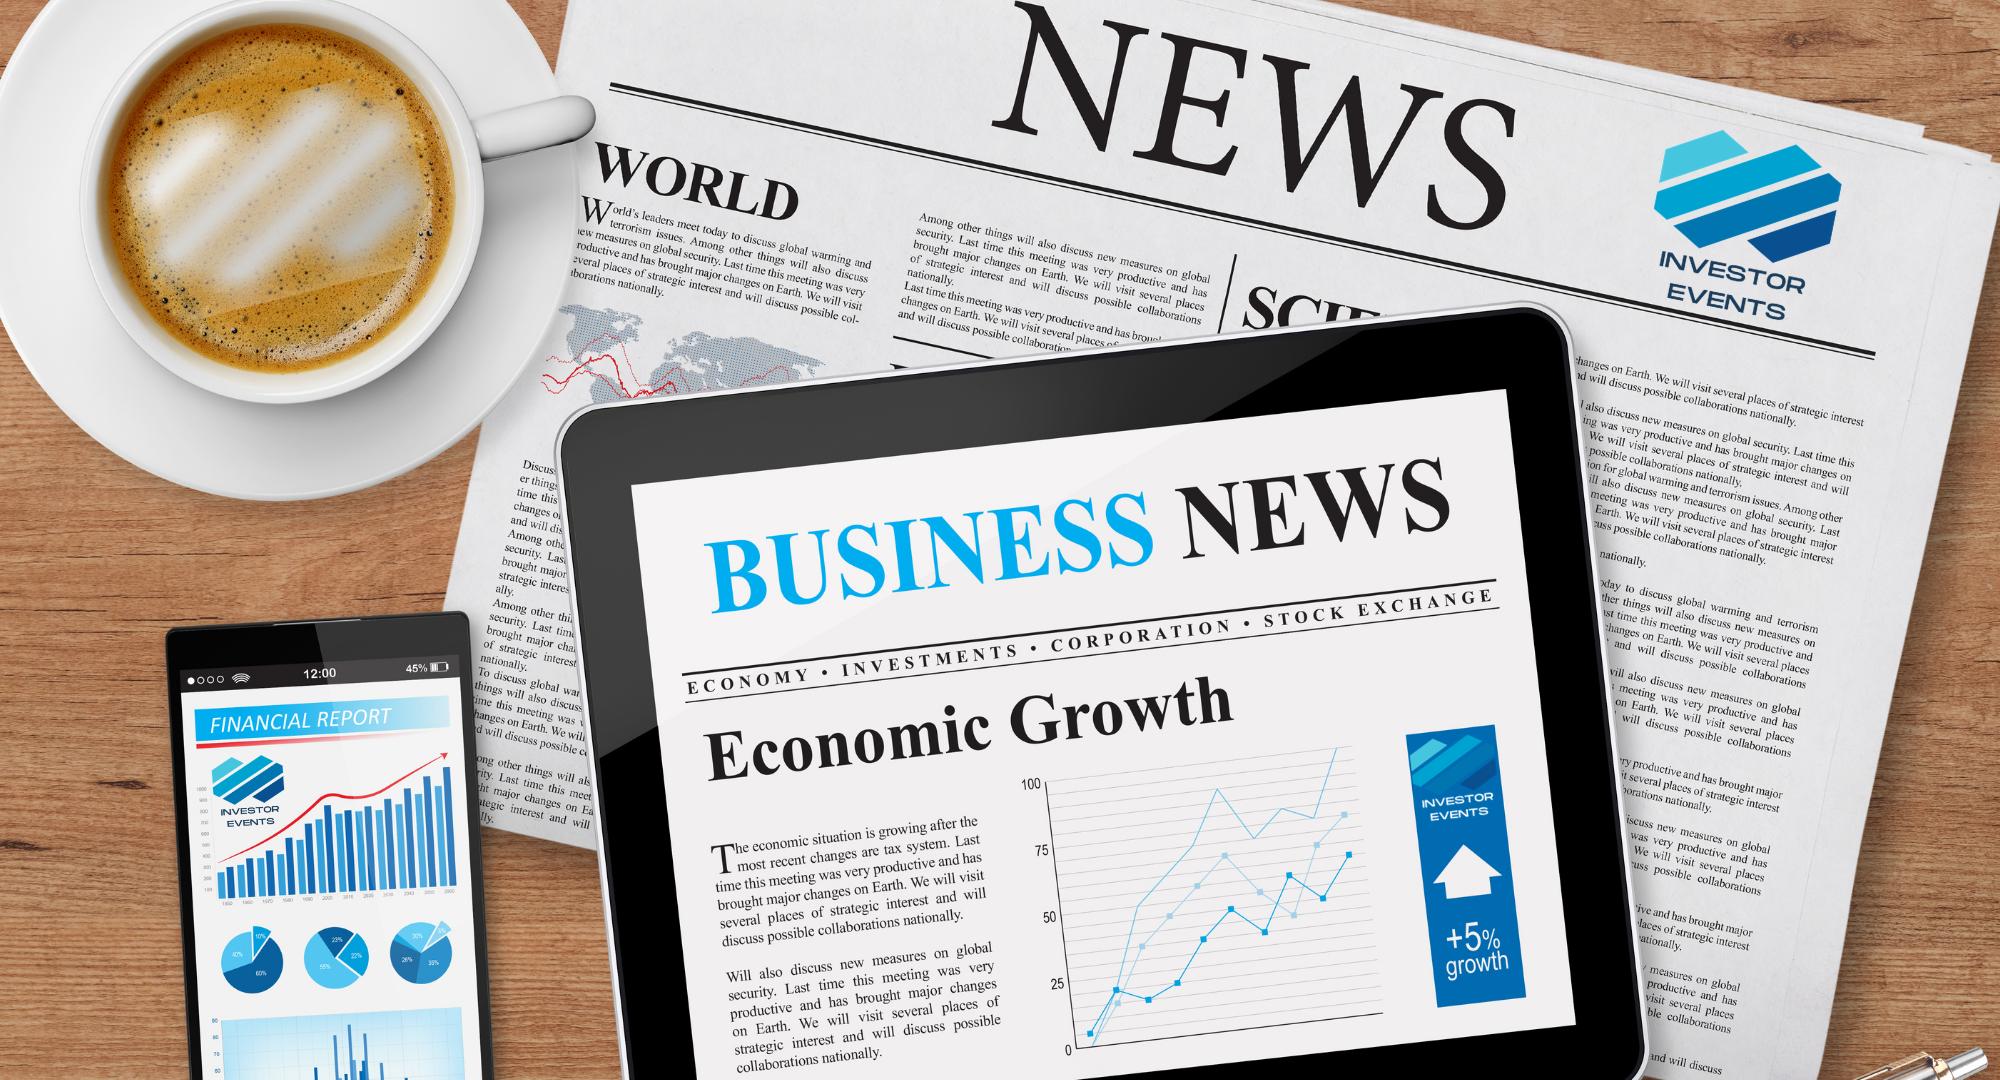 Investor Events News Room